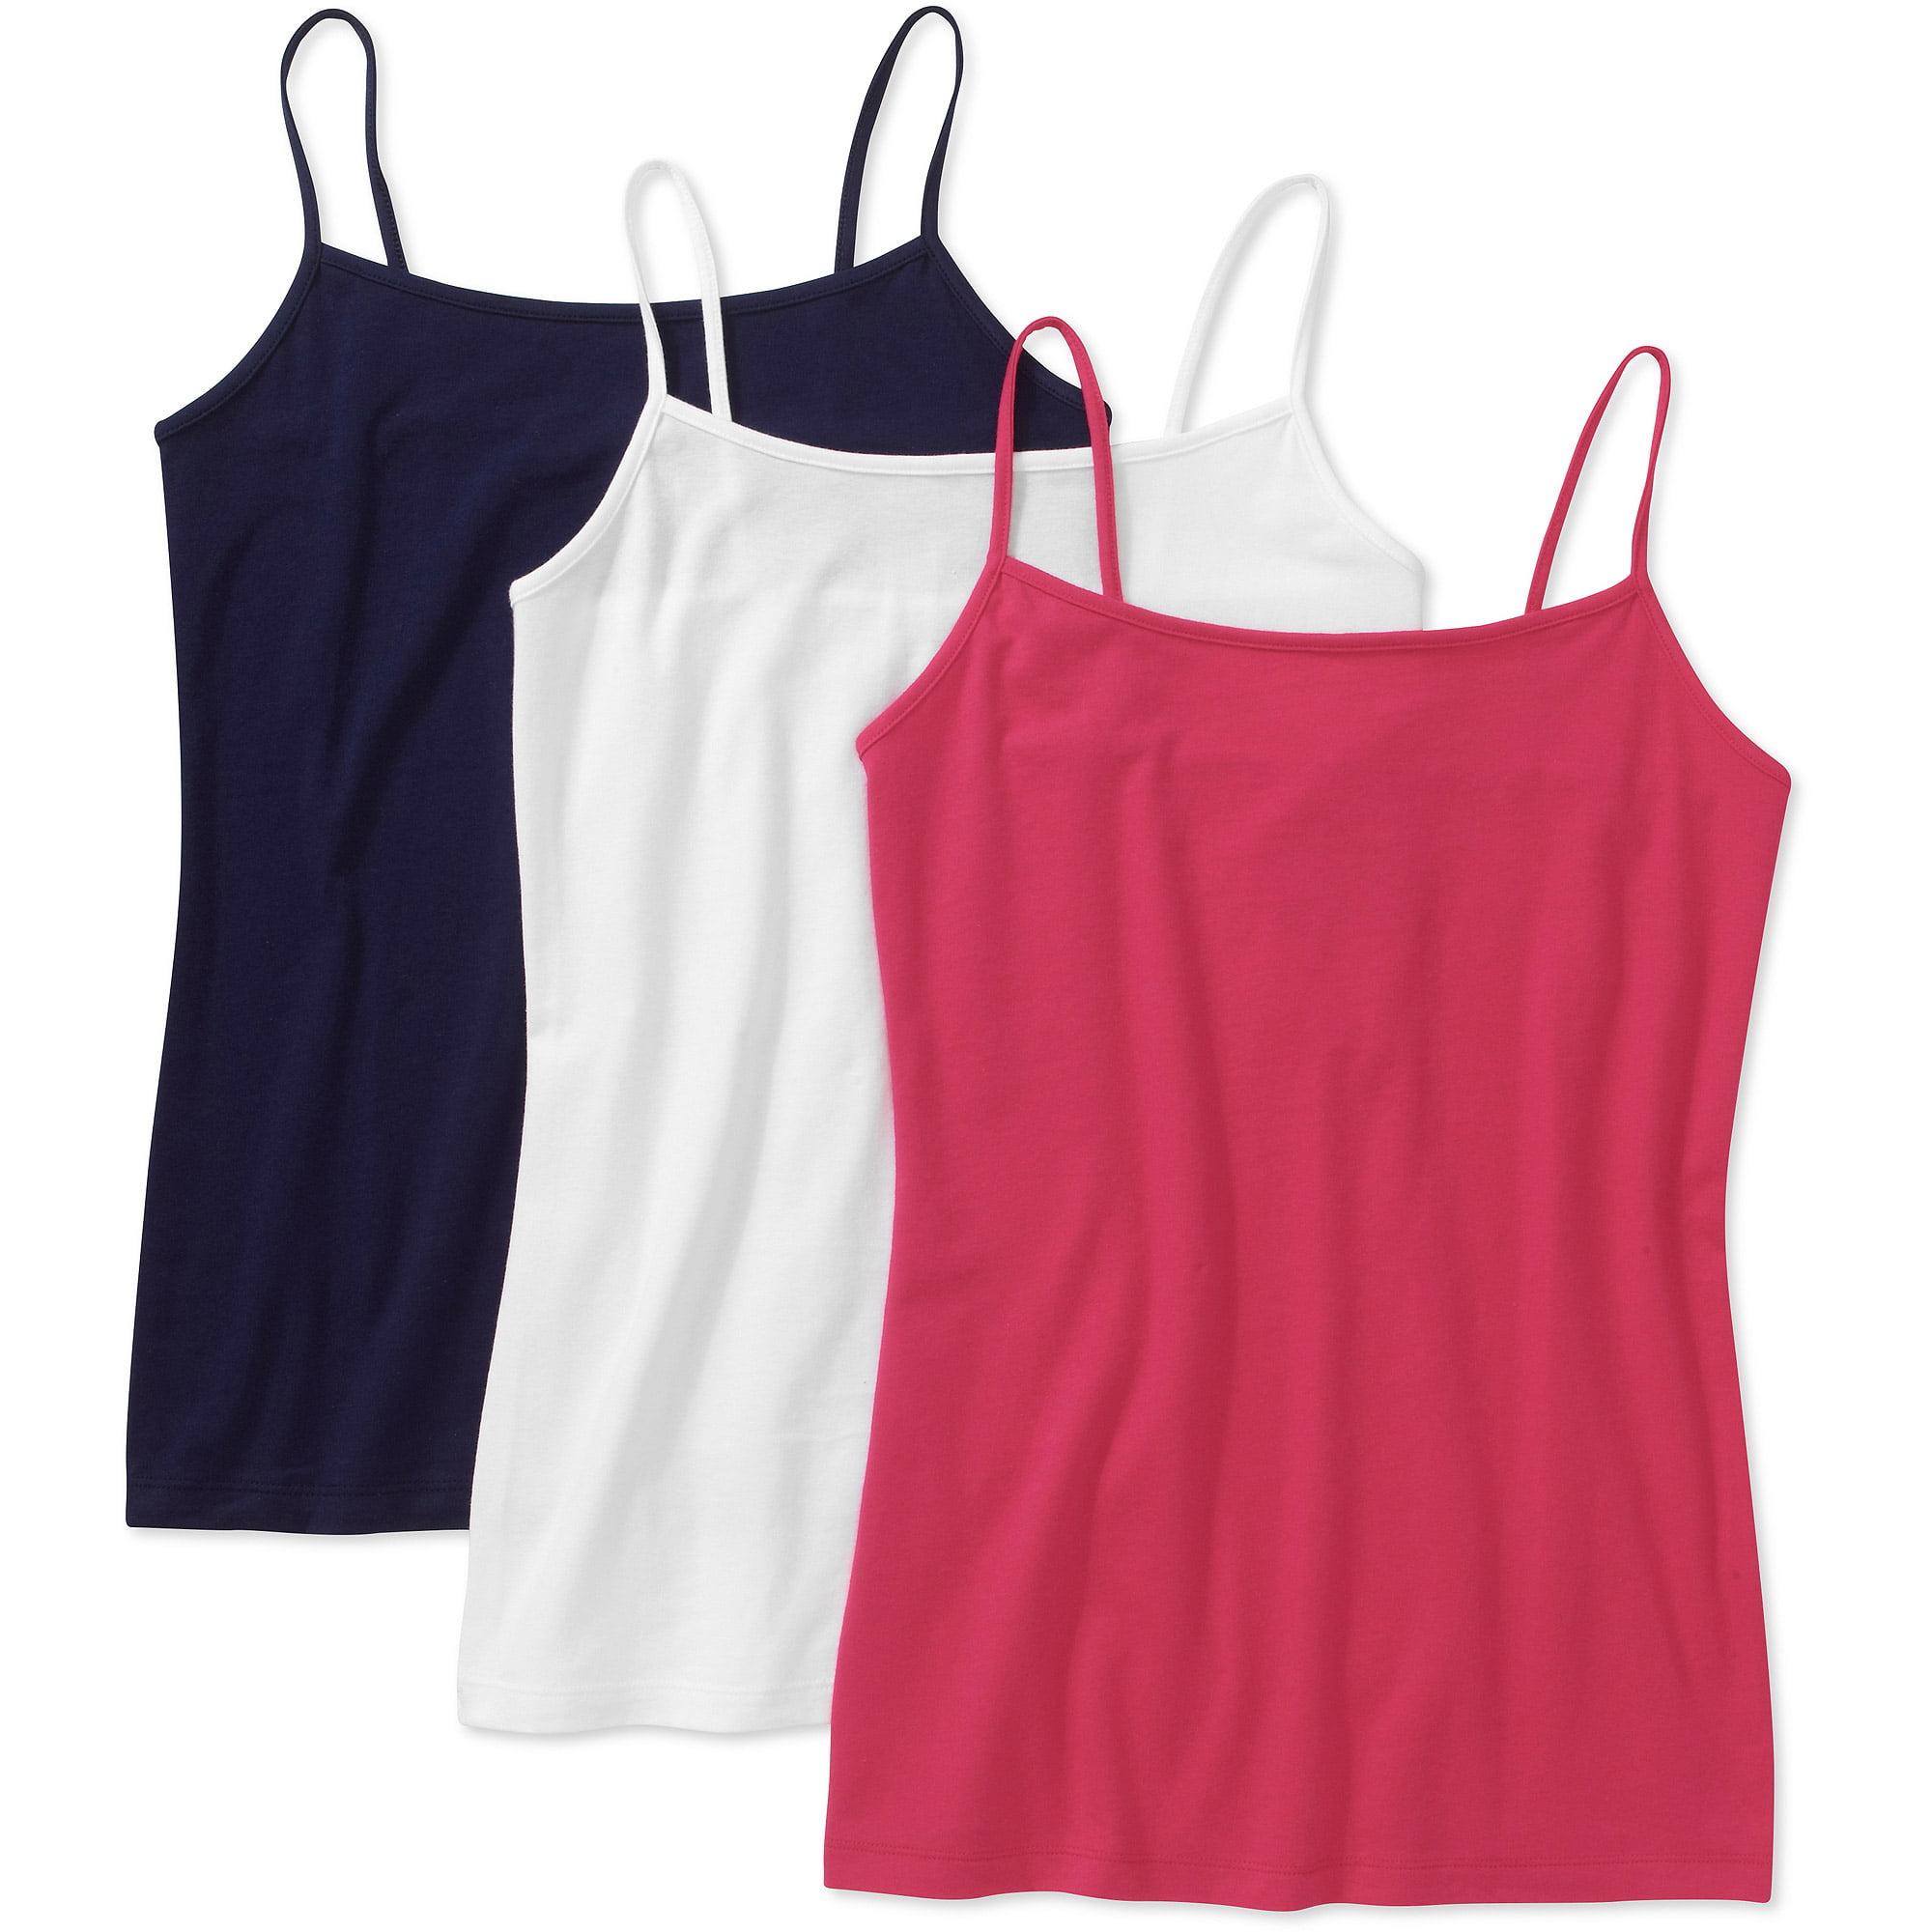 daa4d46efd5a9 Faded Glory - Faded Glory Women s Knit Cami 3 Pack - Walmart.com